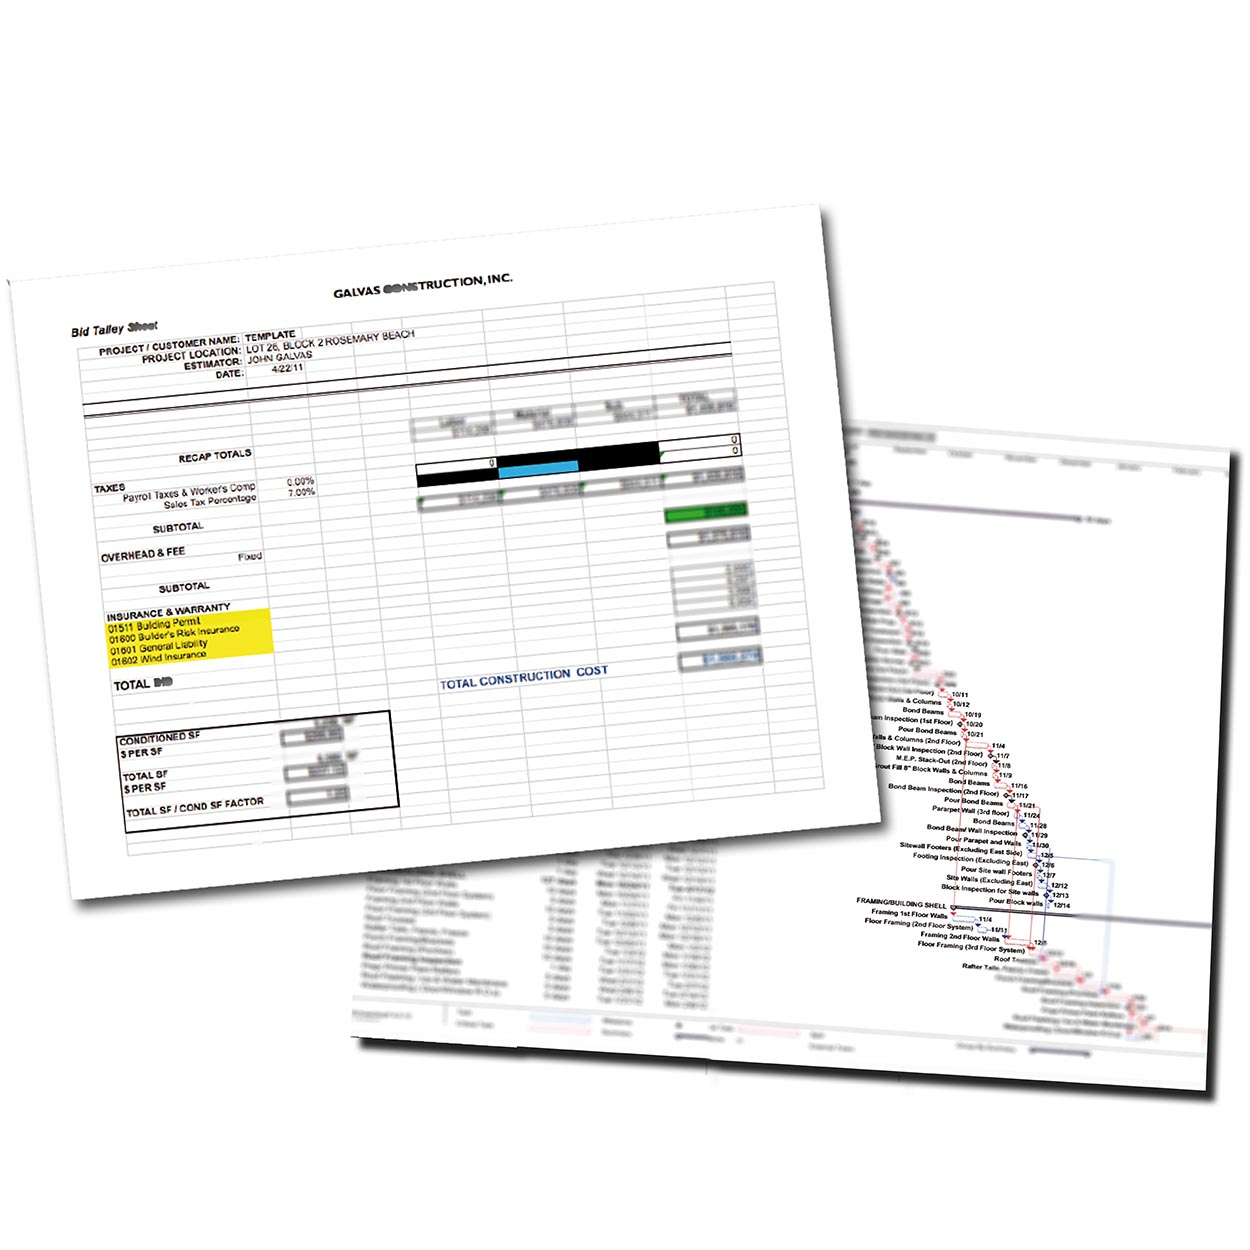 Galvas Construction - On Budget